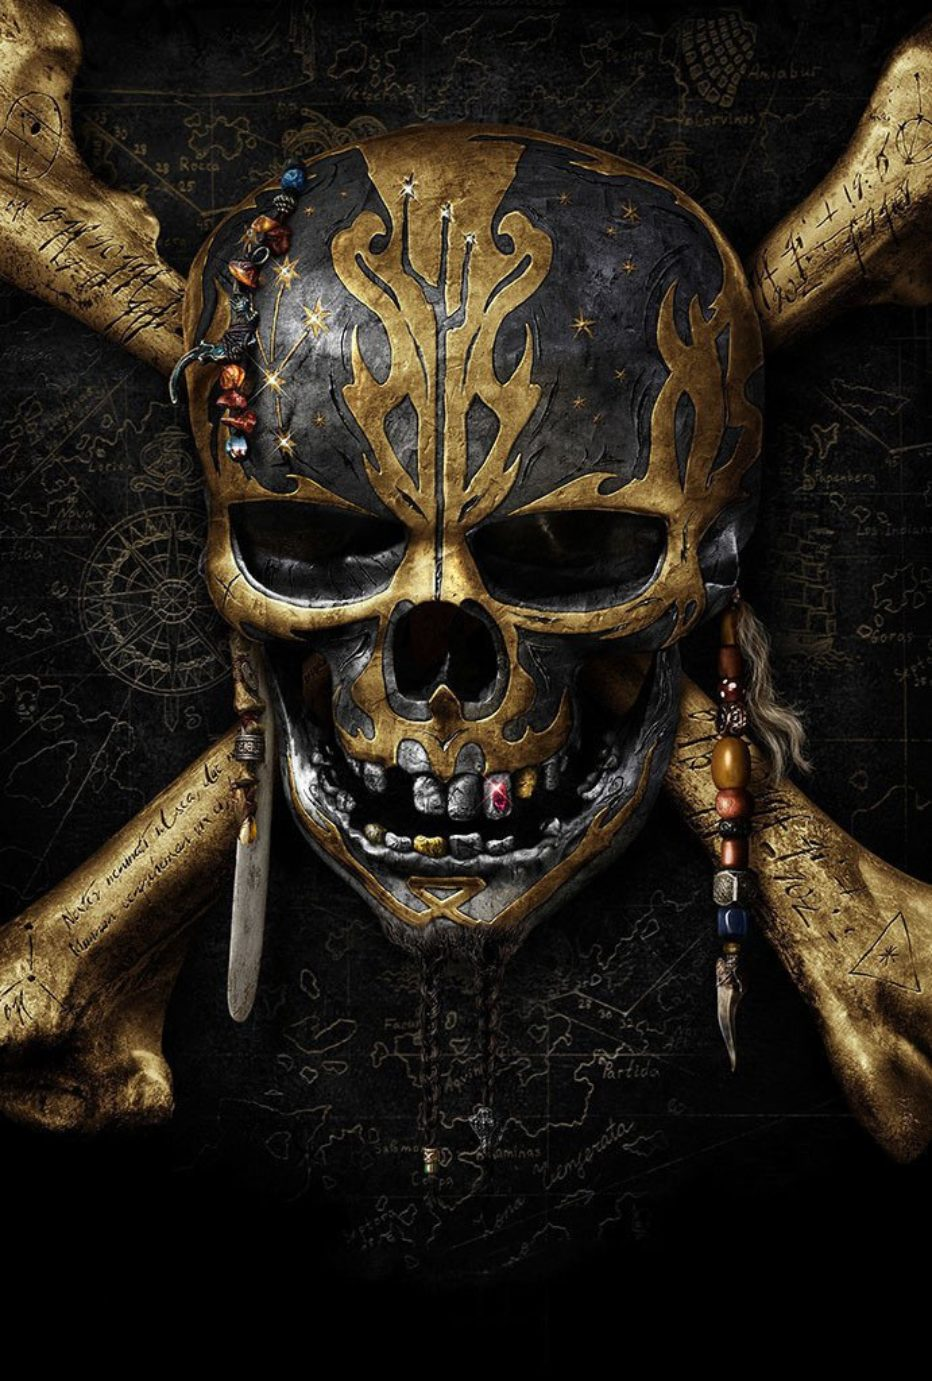 Teaser trailer de Piratas del caribe 5